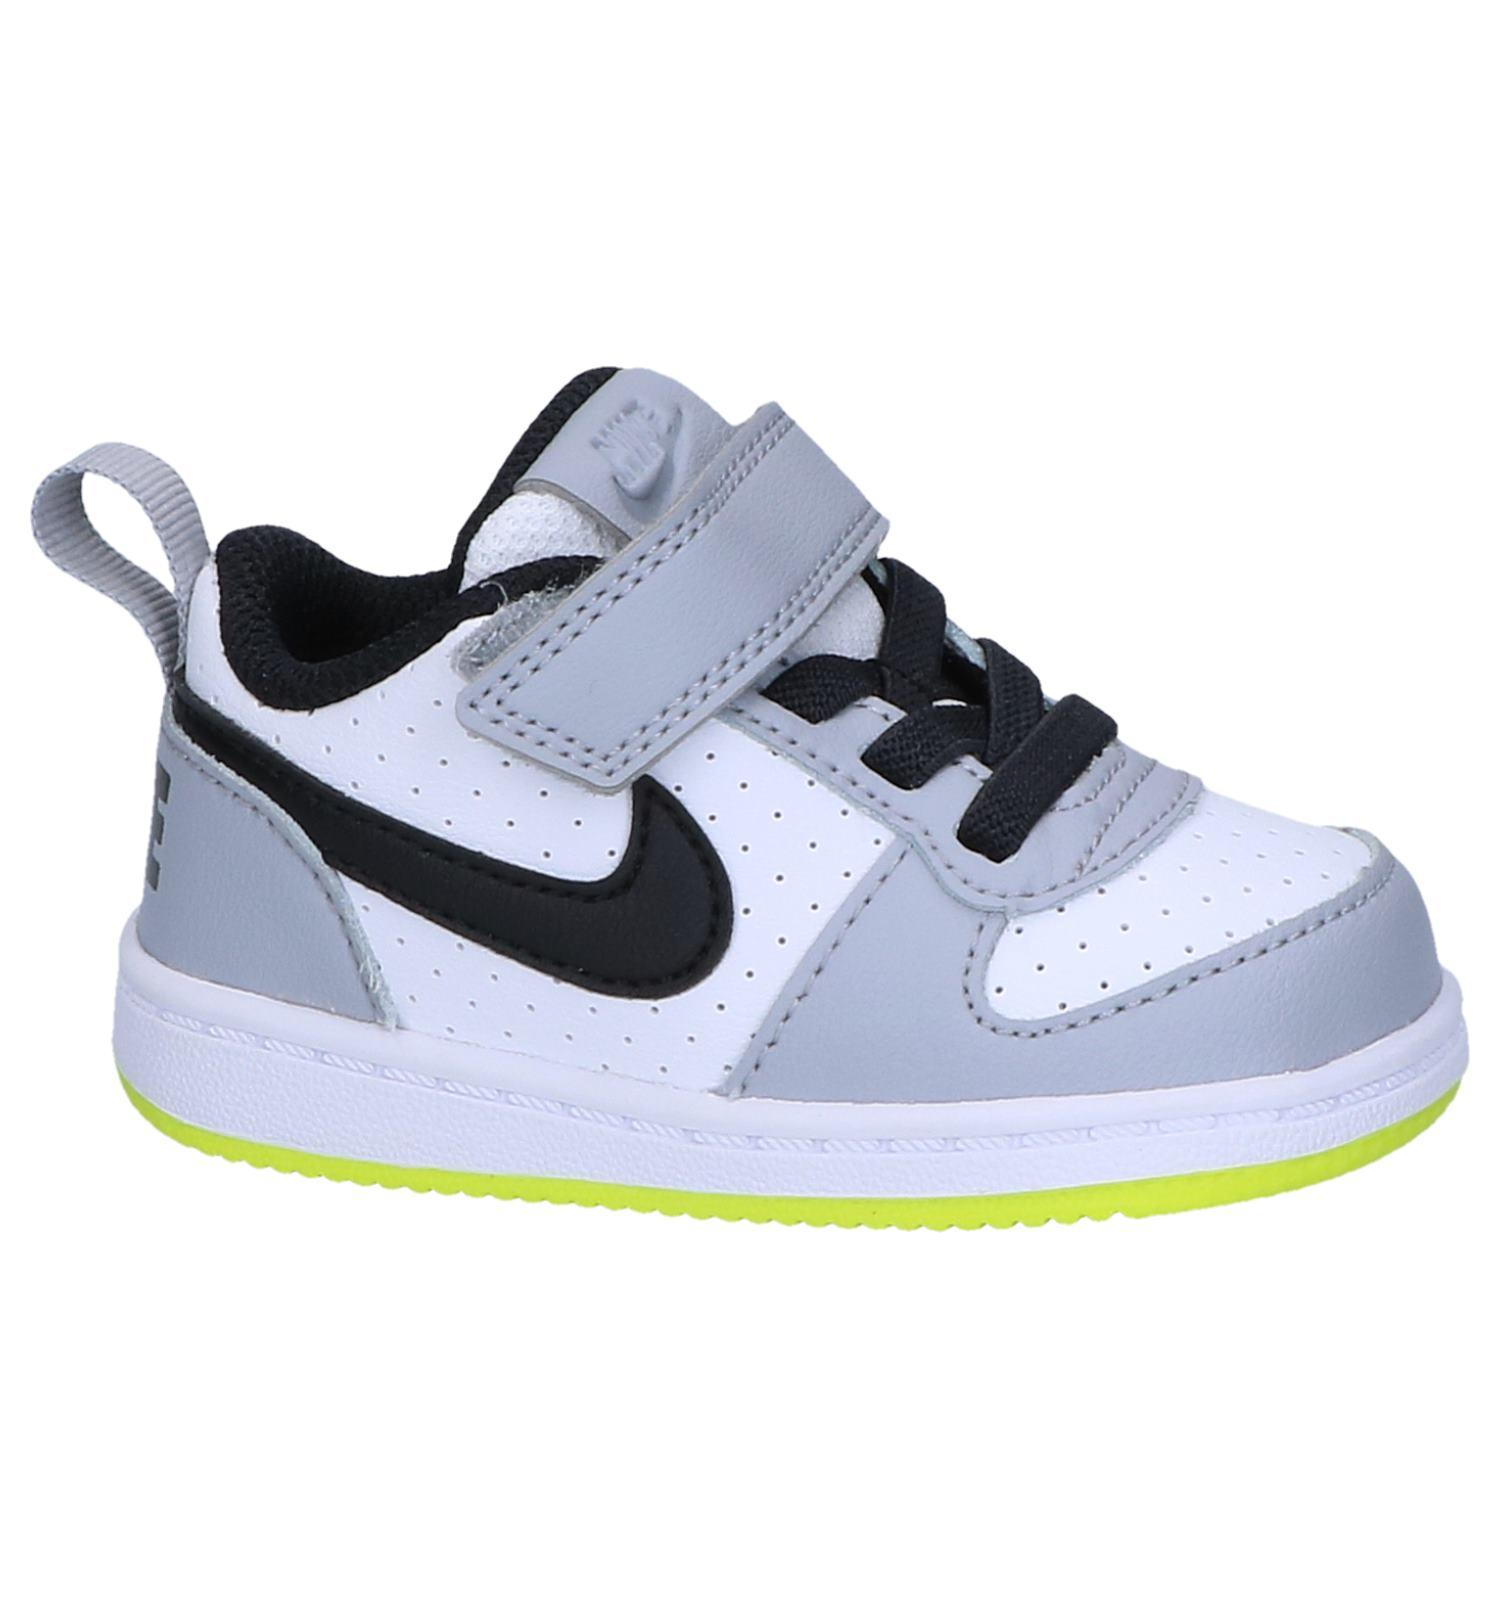 c2a16e1bd6b81 Nike Baskets pour bébé (Blanc)